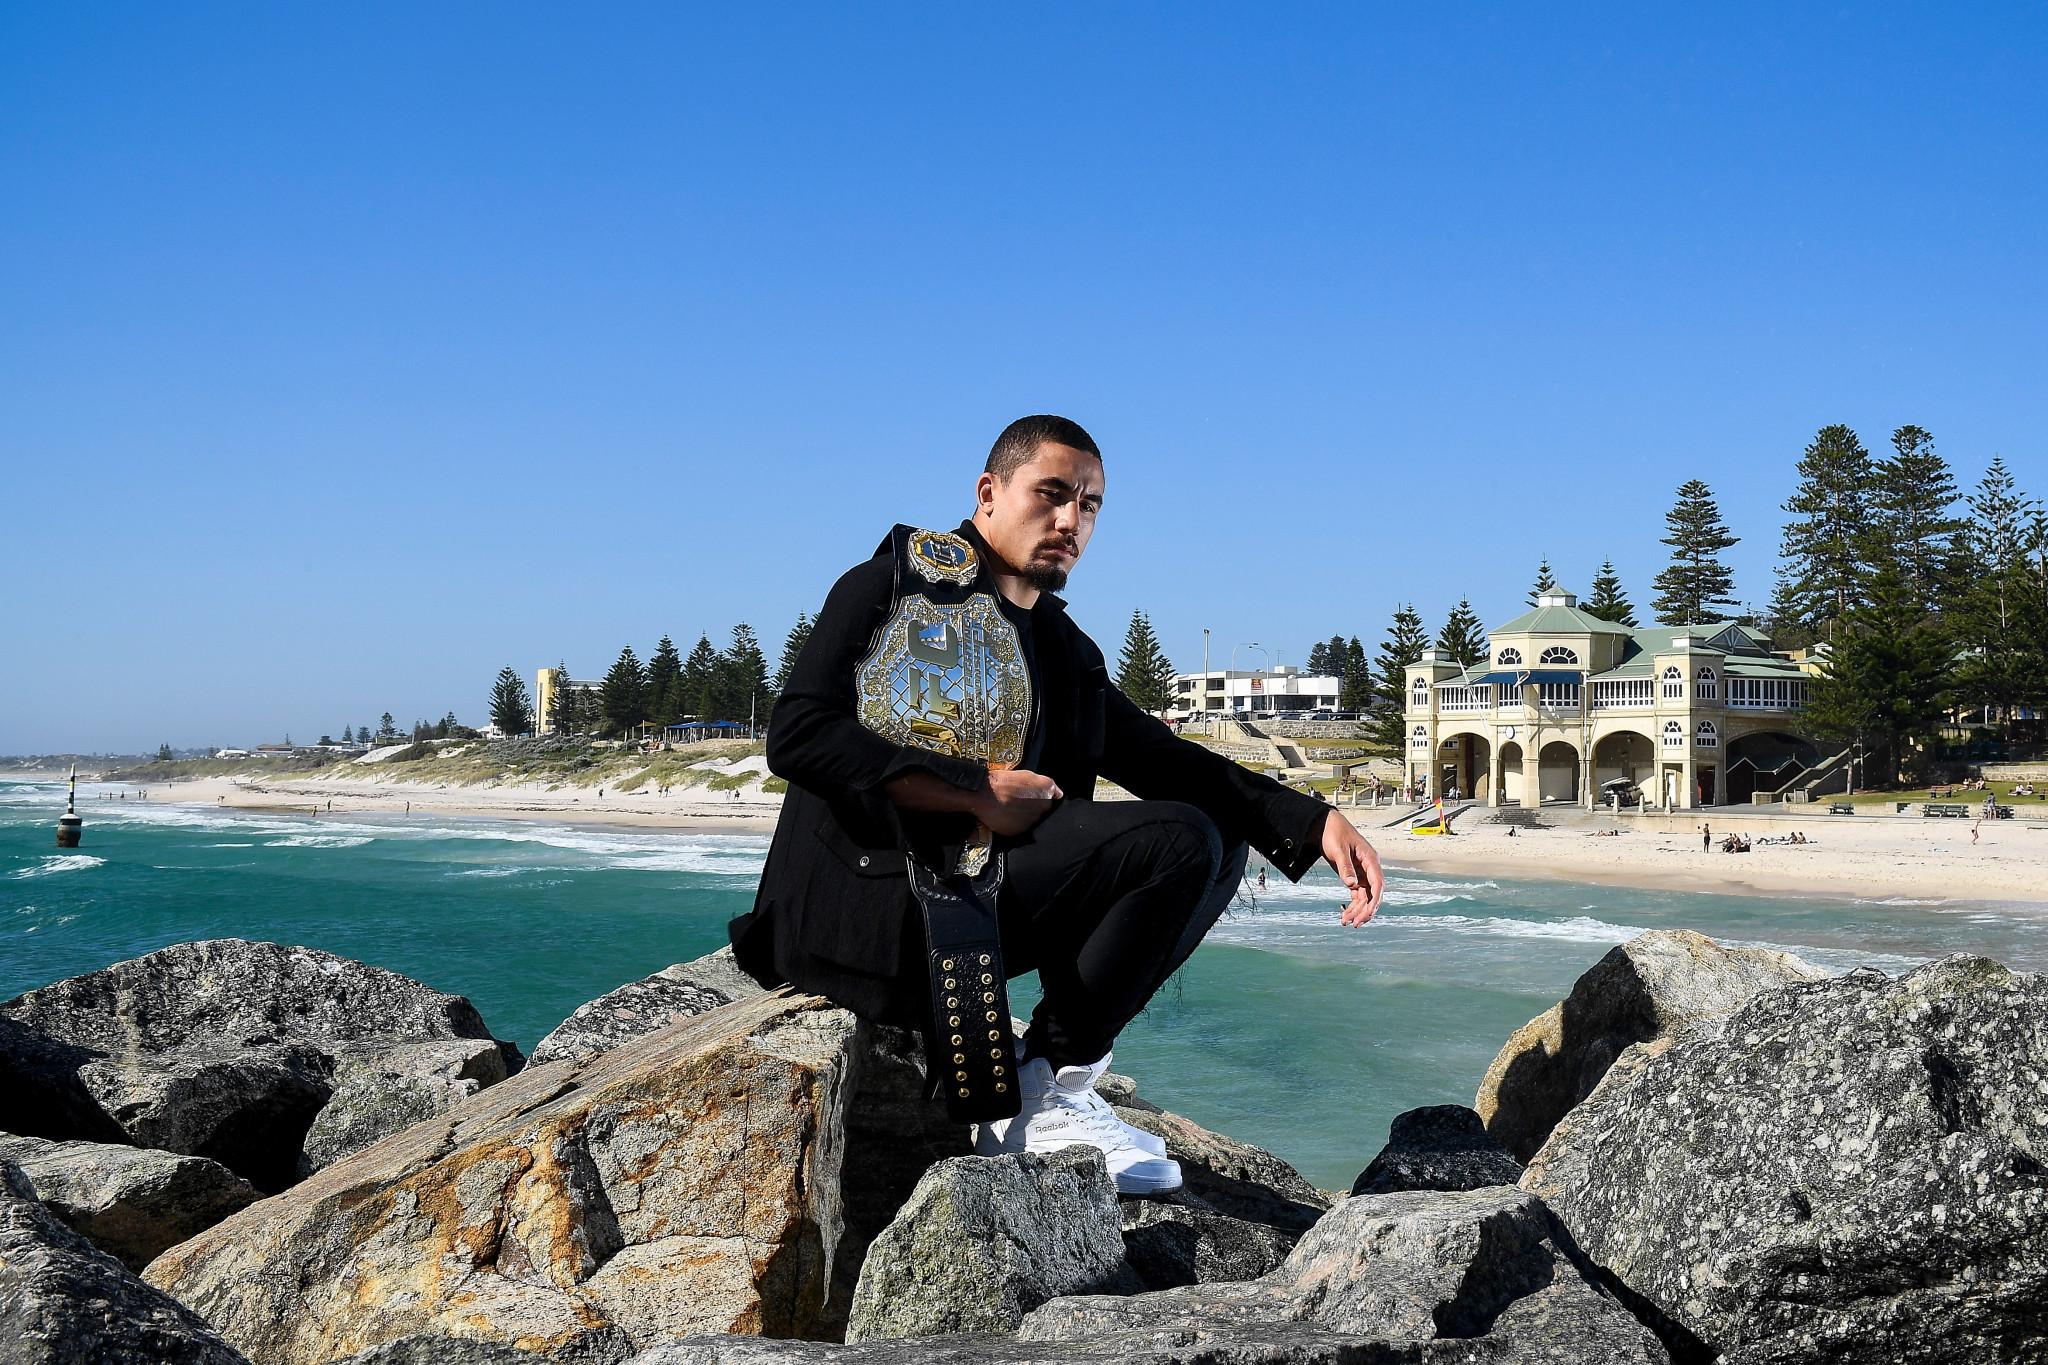 UFC star Whittaker boosts Gold Coast 2018 wrestling hopes